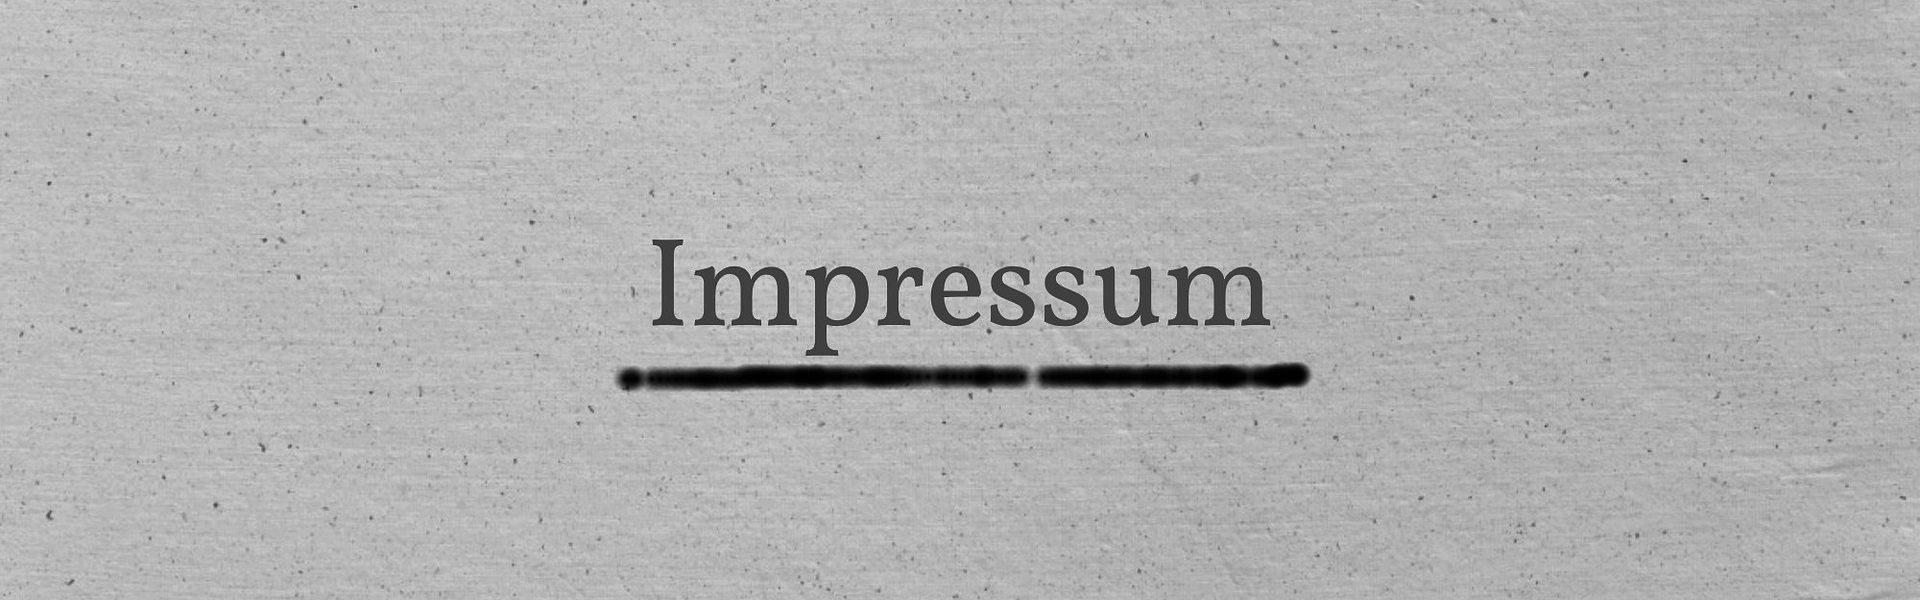 imprint-1355328_1920